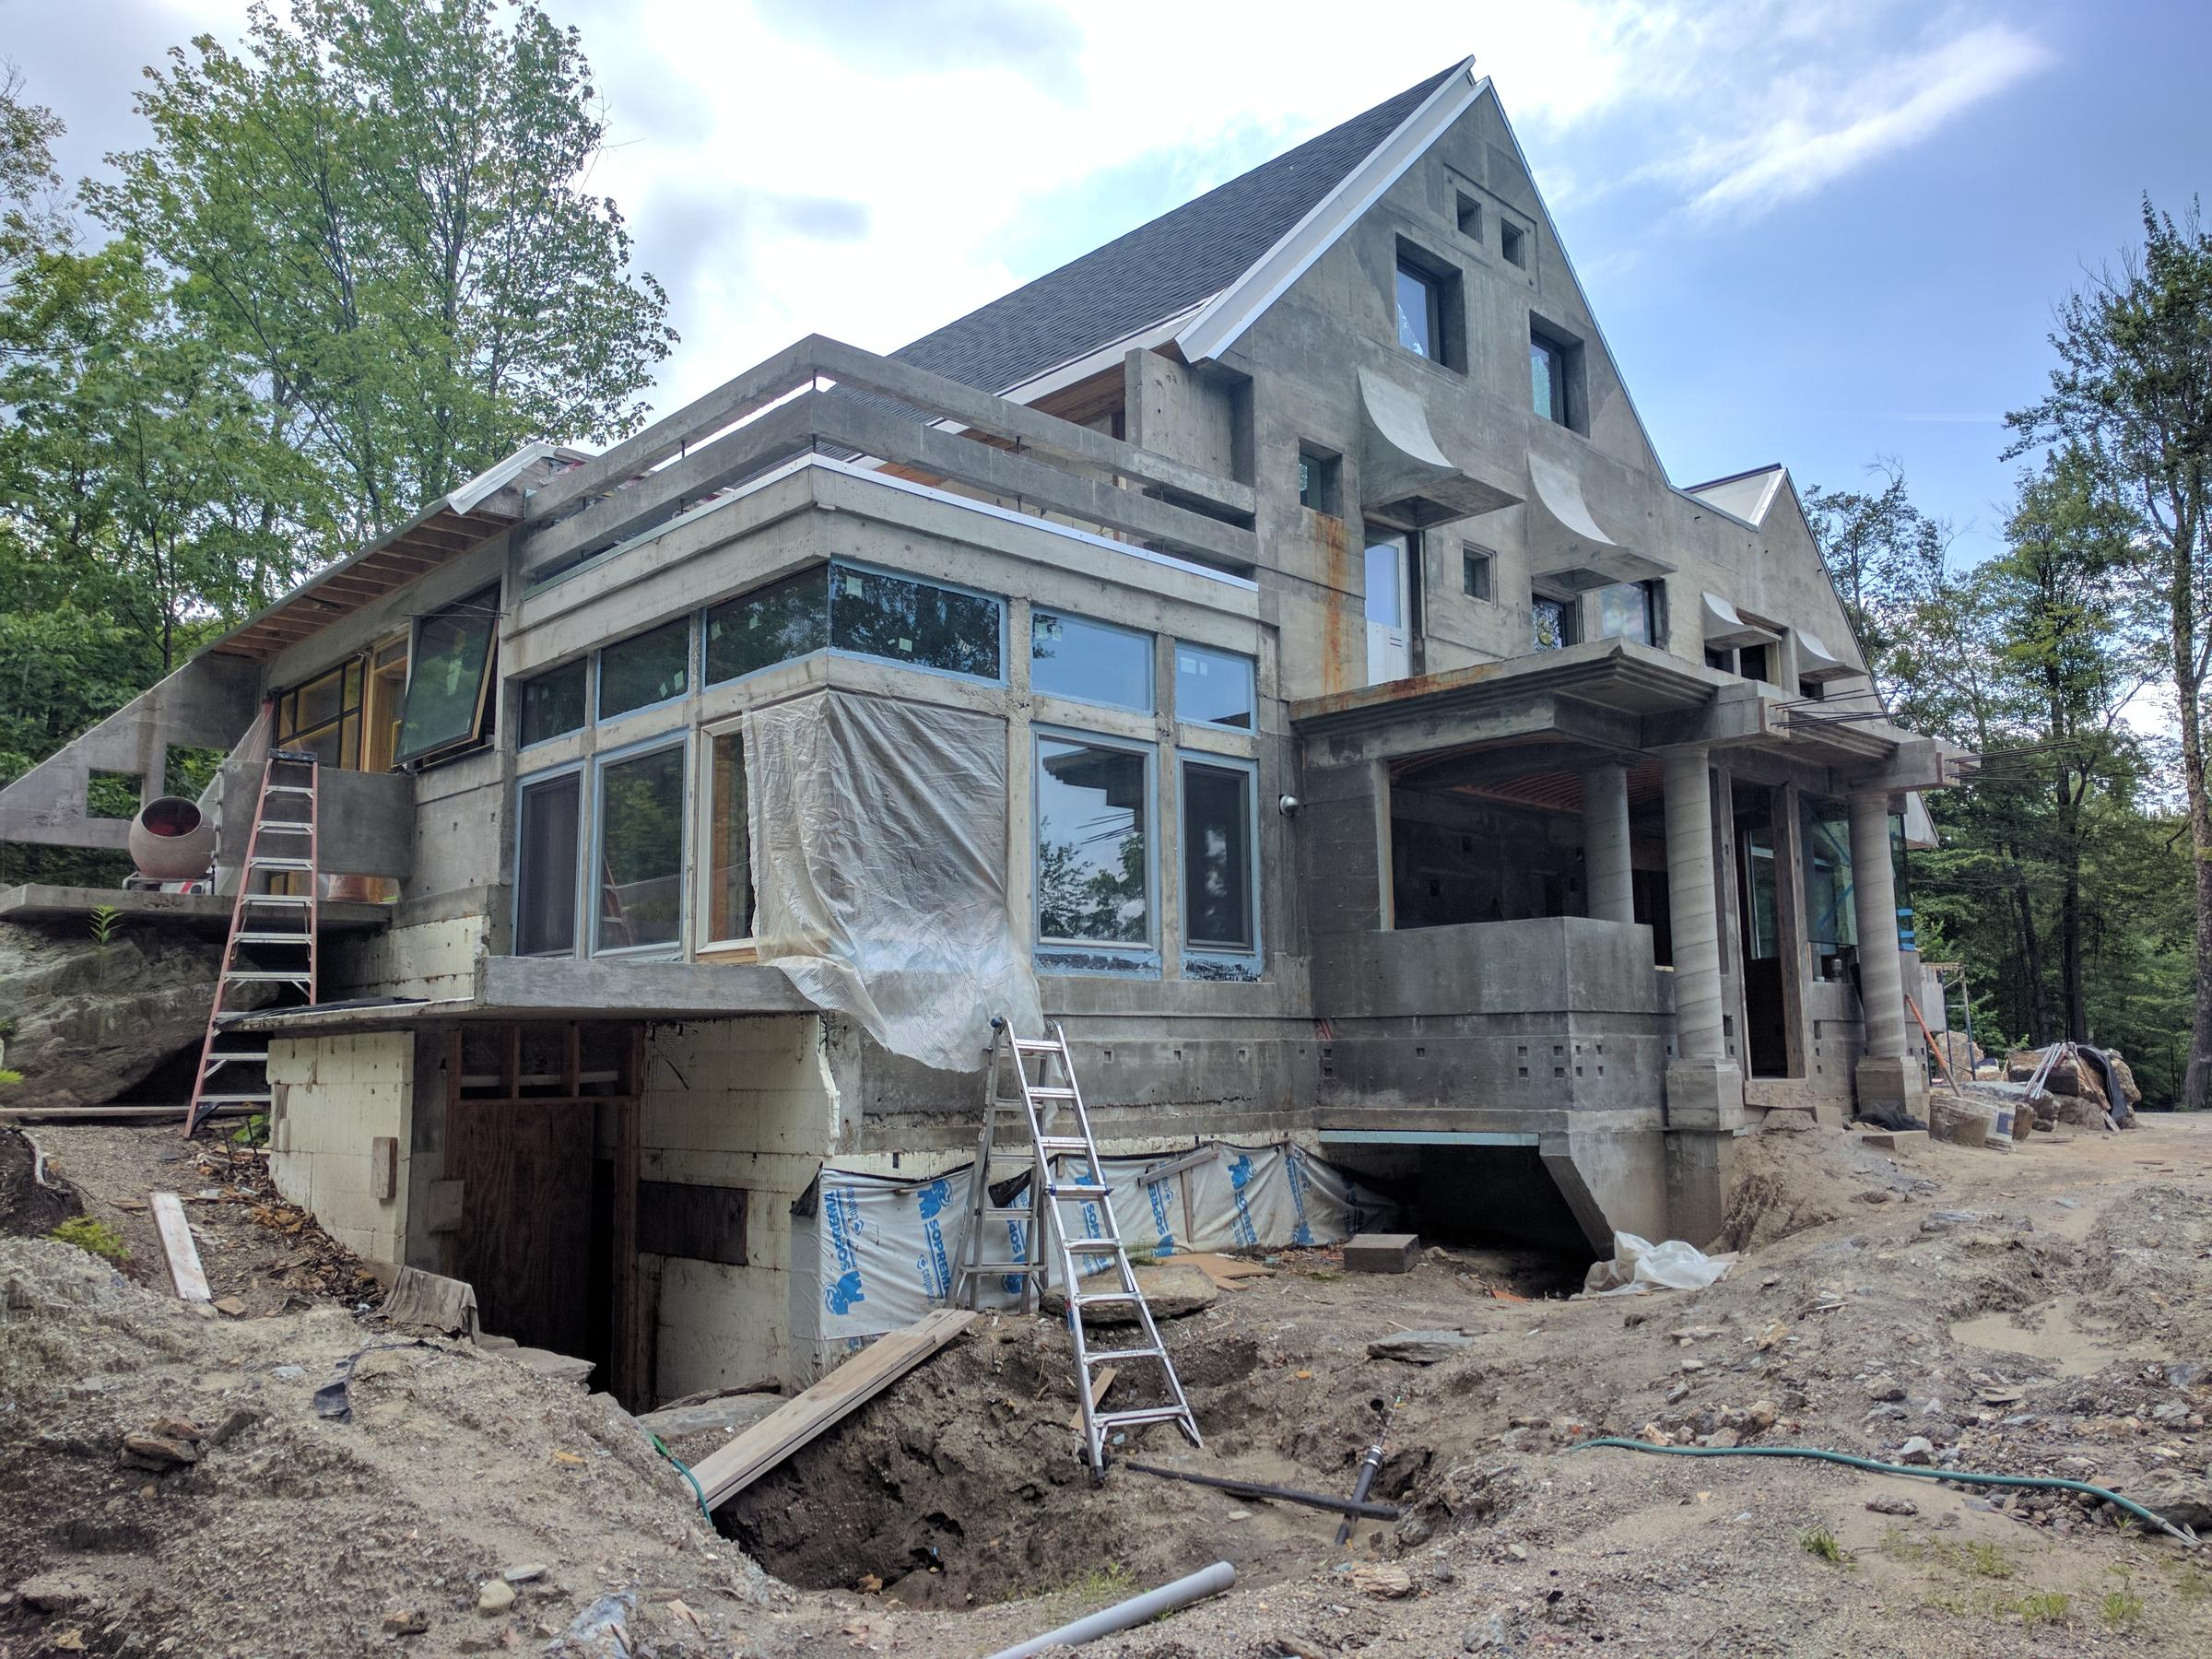 Best Kitchen Gallery: Want To Build An Energy Efficient House Try Concrete Connecticut of Build Concrete Home on rachelxblog.com